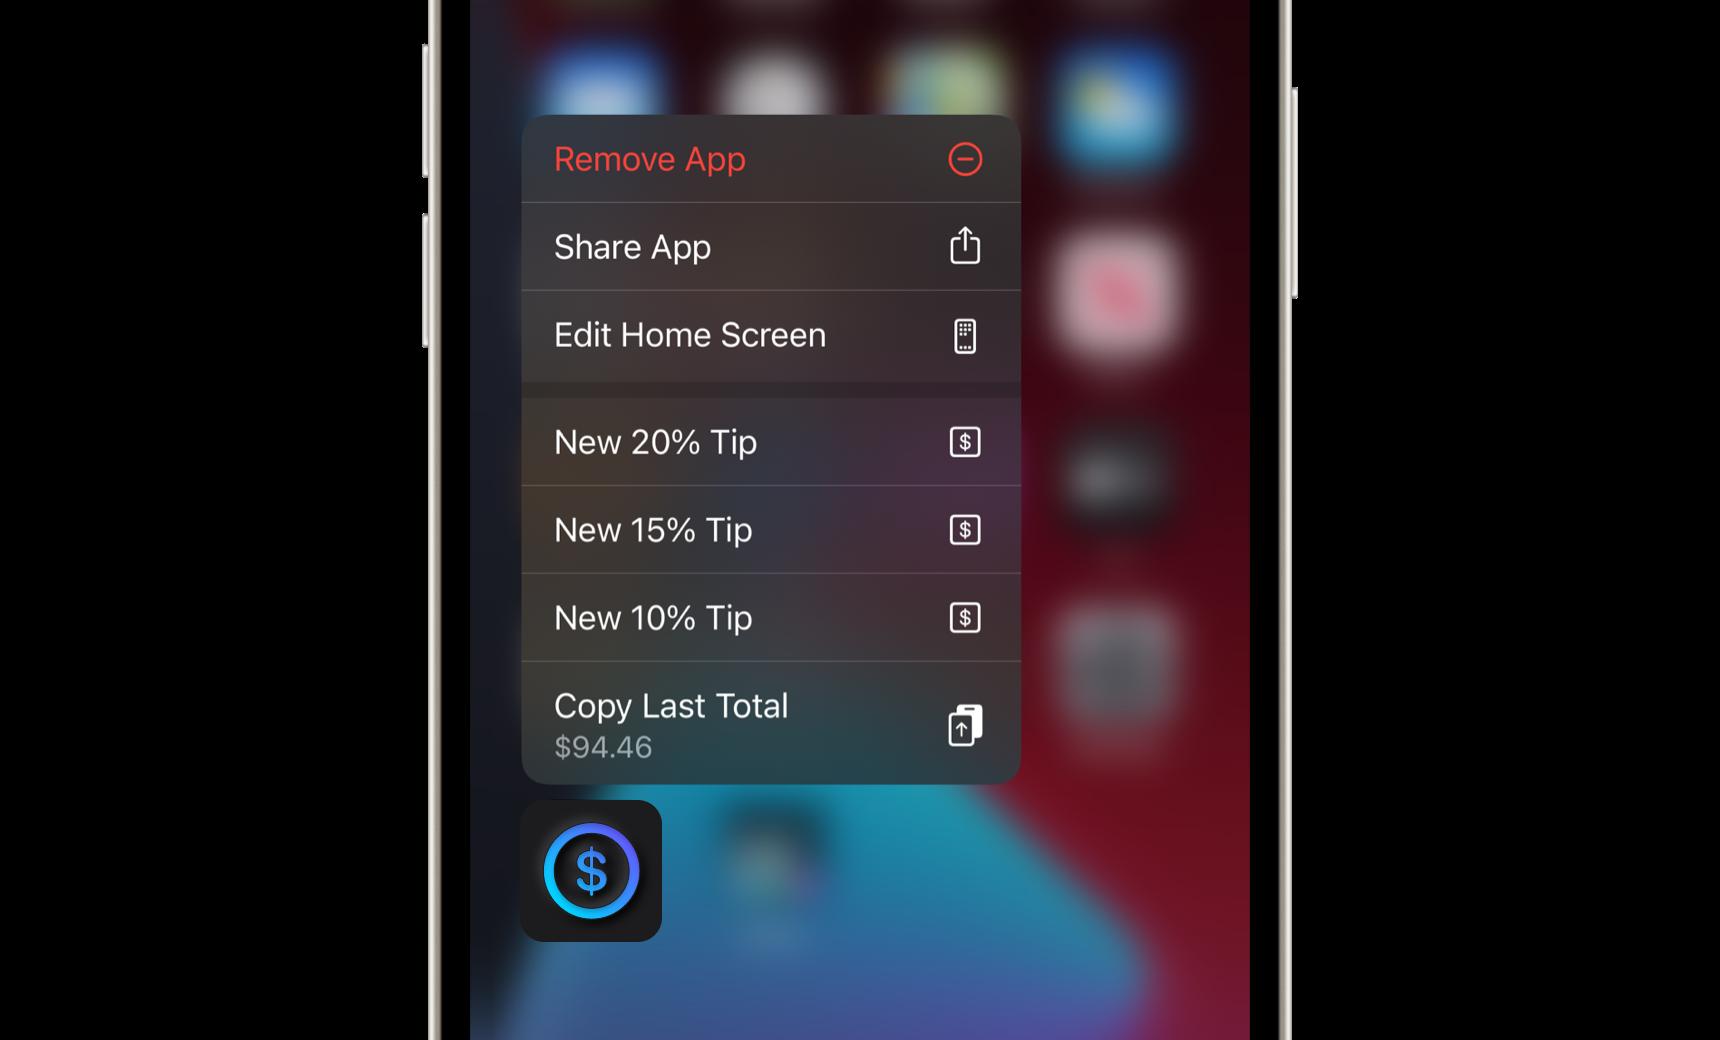 Tip App - Shortcut Actions